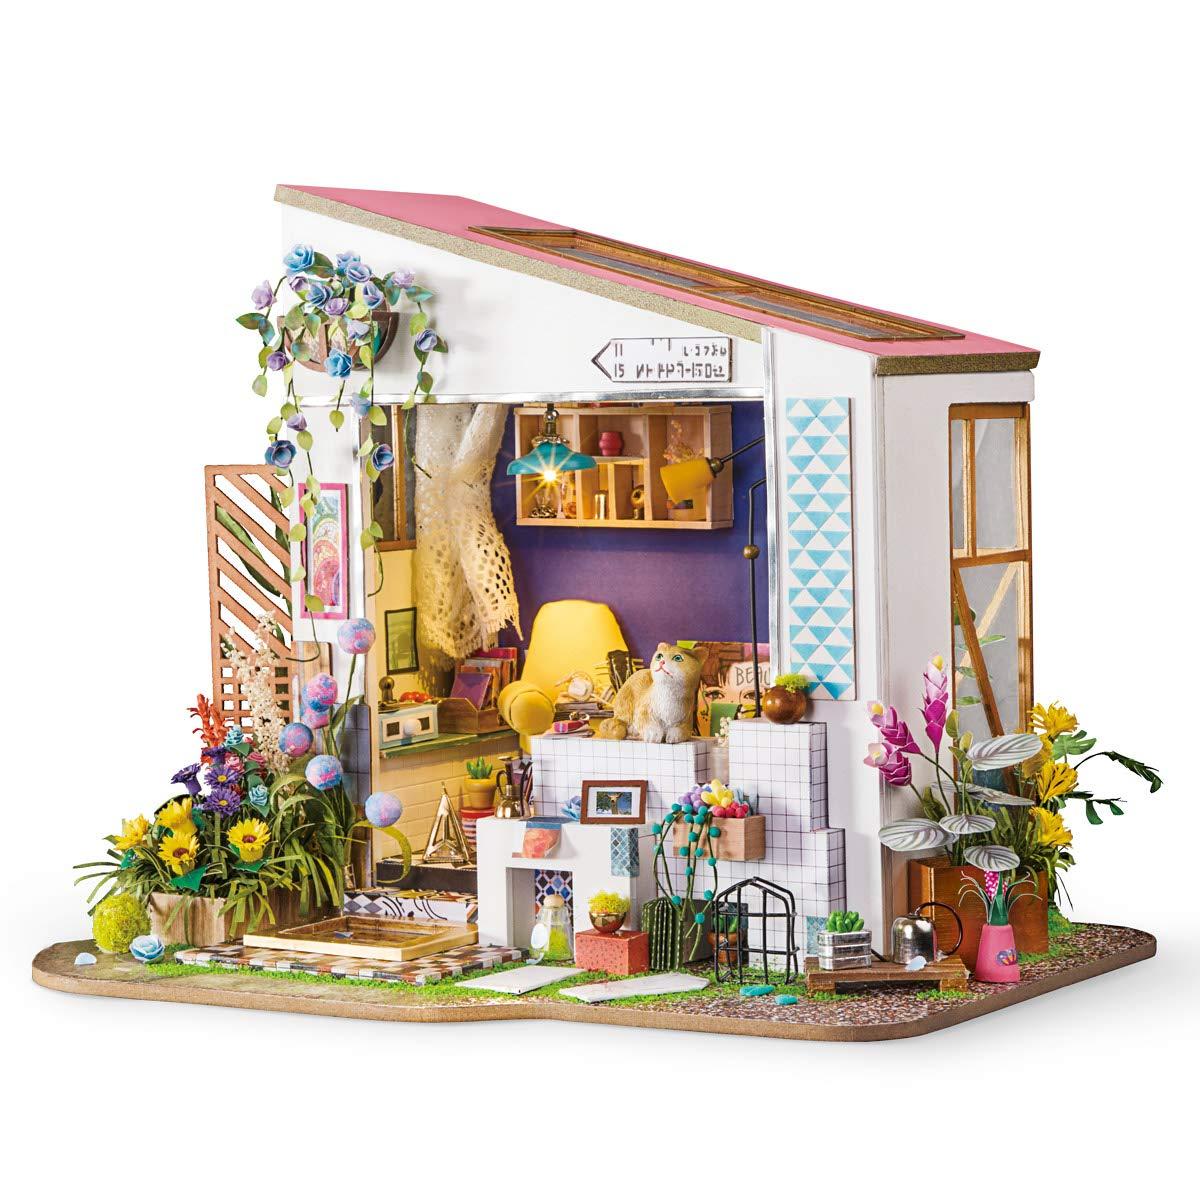 Doll Houses 3d Wooden Dollhouse Handmade Miniature Mini Doll Houses Diy Garden Model To Build Set Toys For Children Christmas Gift Toys & Hobbies